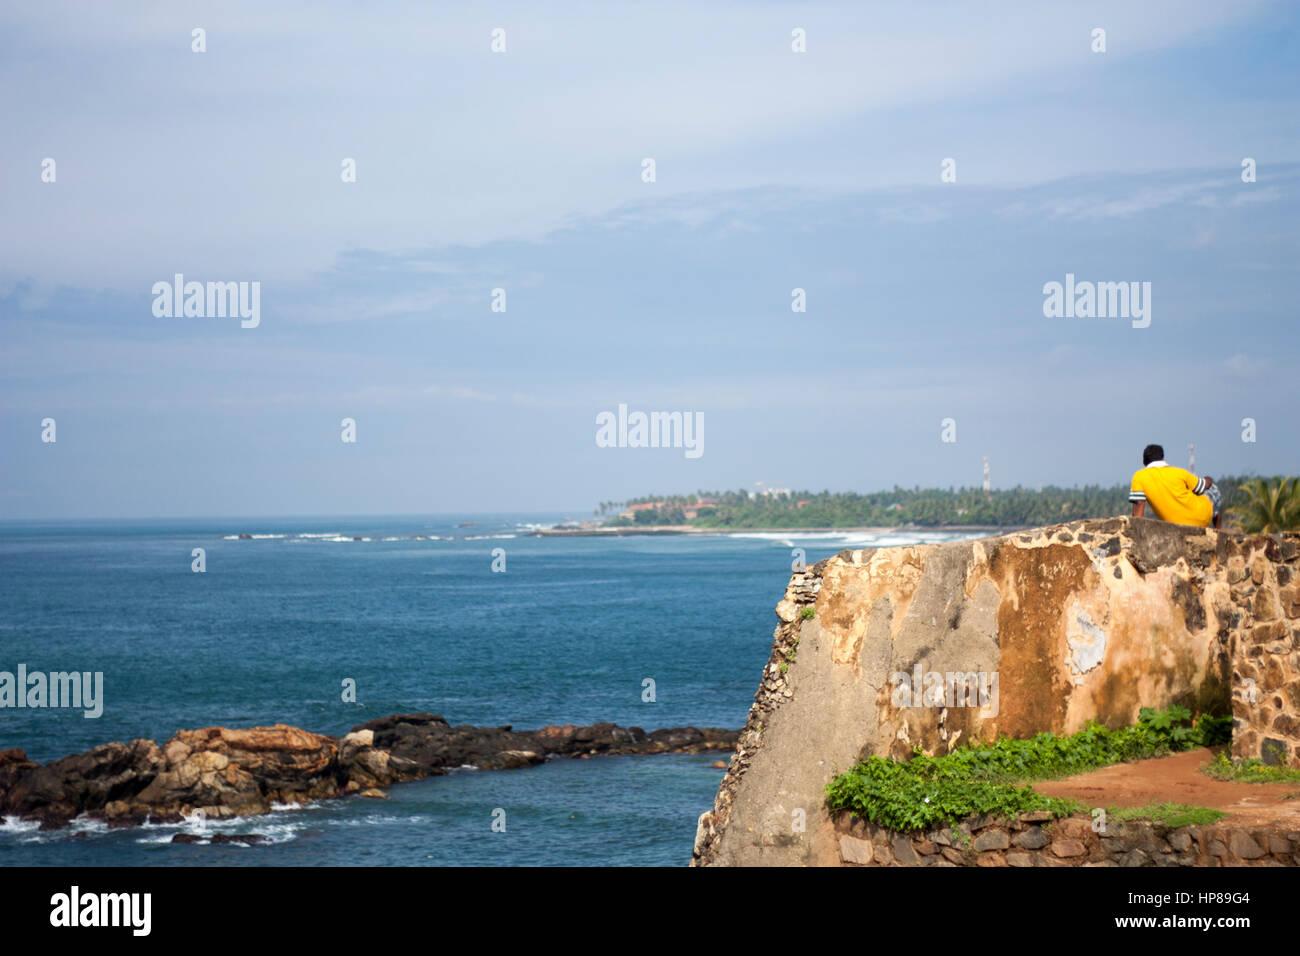 Galle, Sri Lanka. - Stock Image